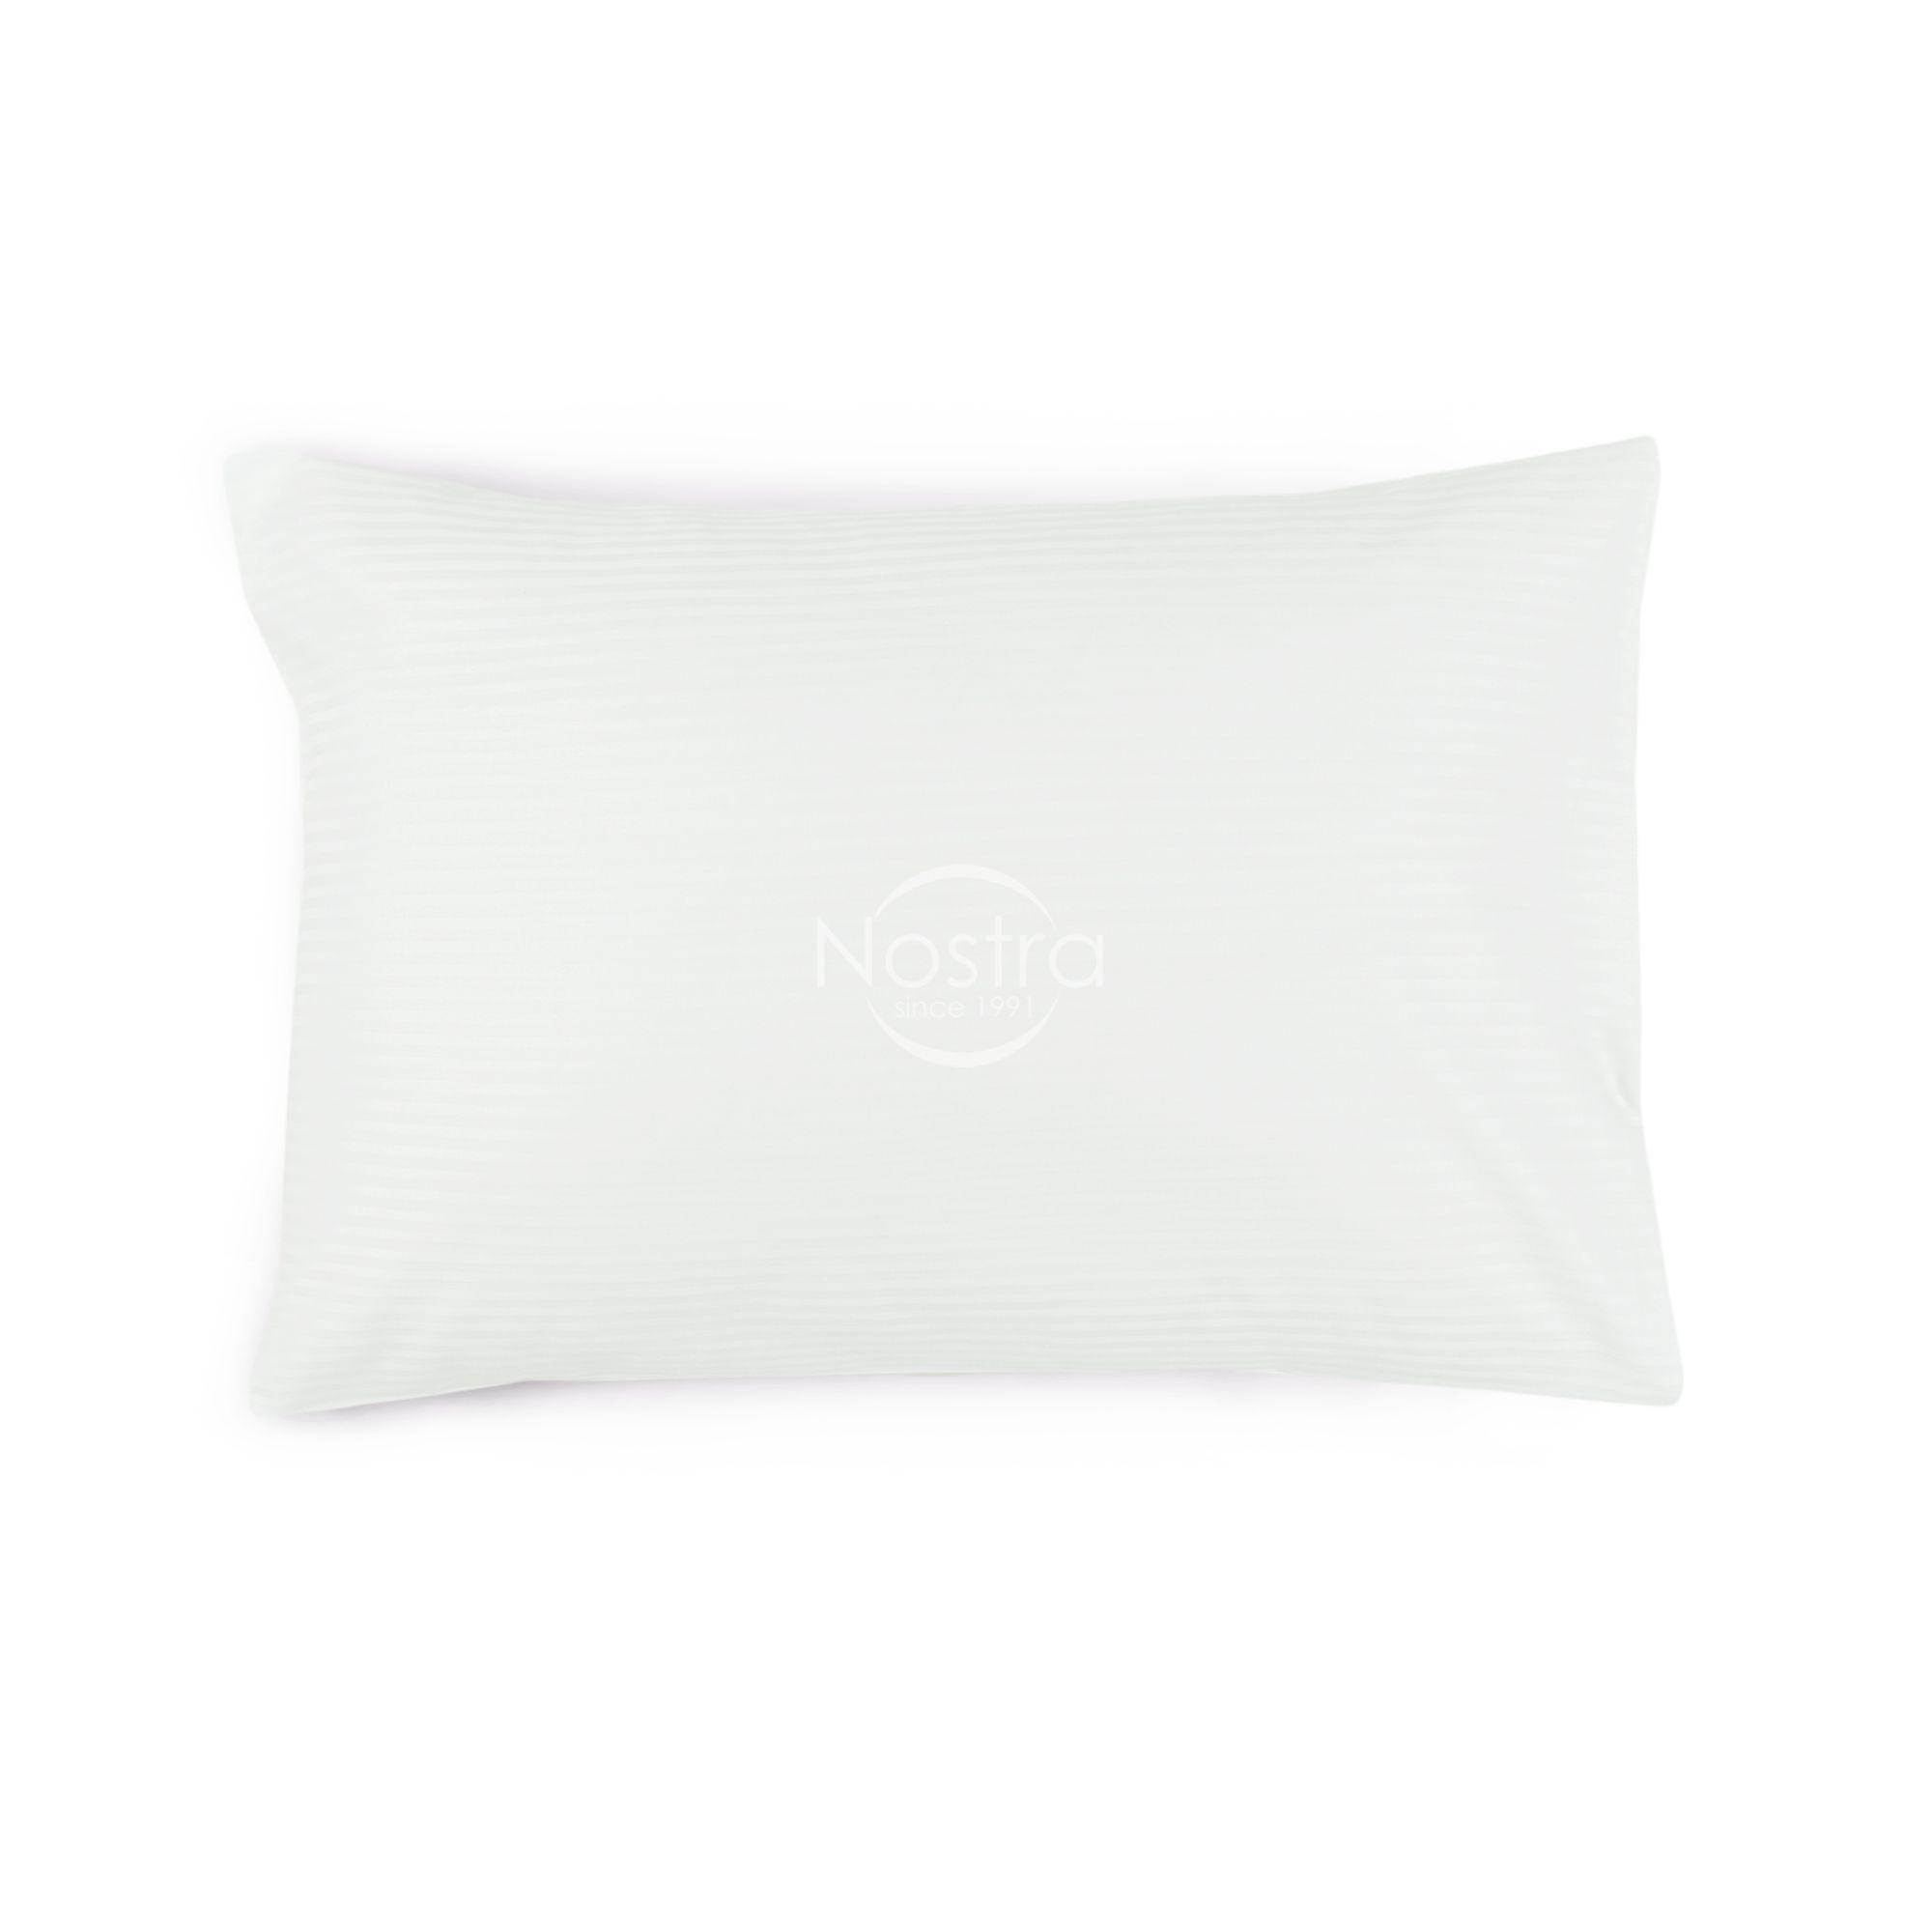 Satino pagalvės užvalkalas MONACO 0,4CM MONAKO